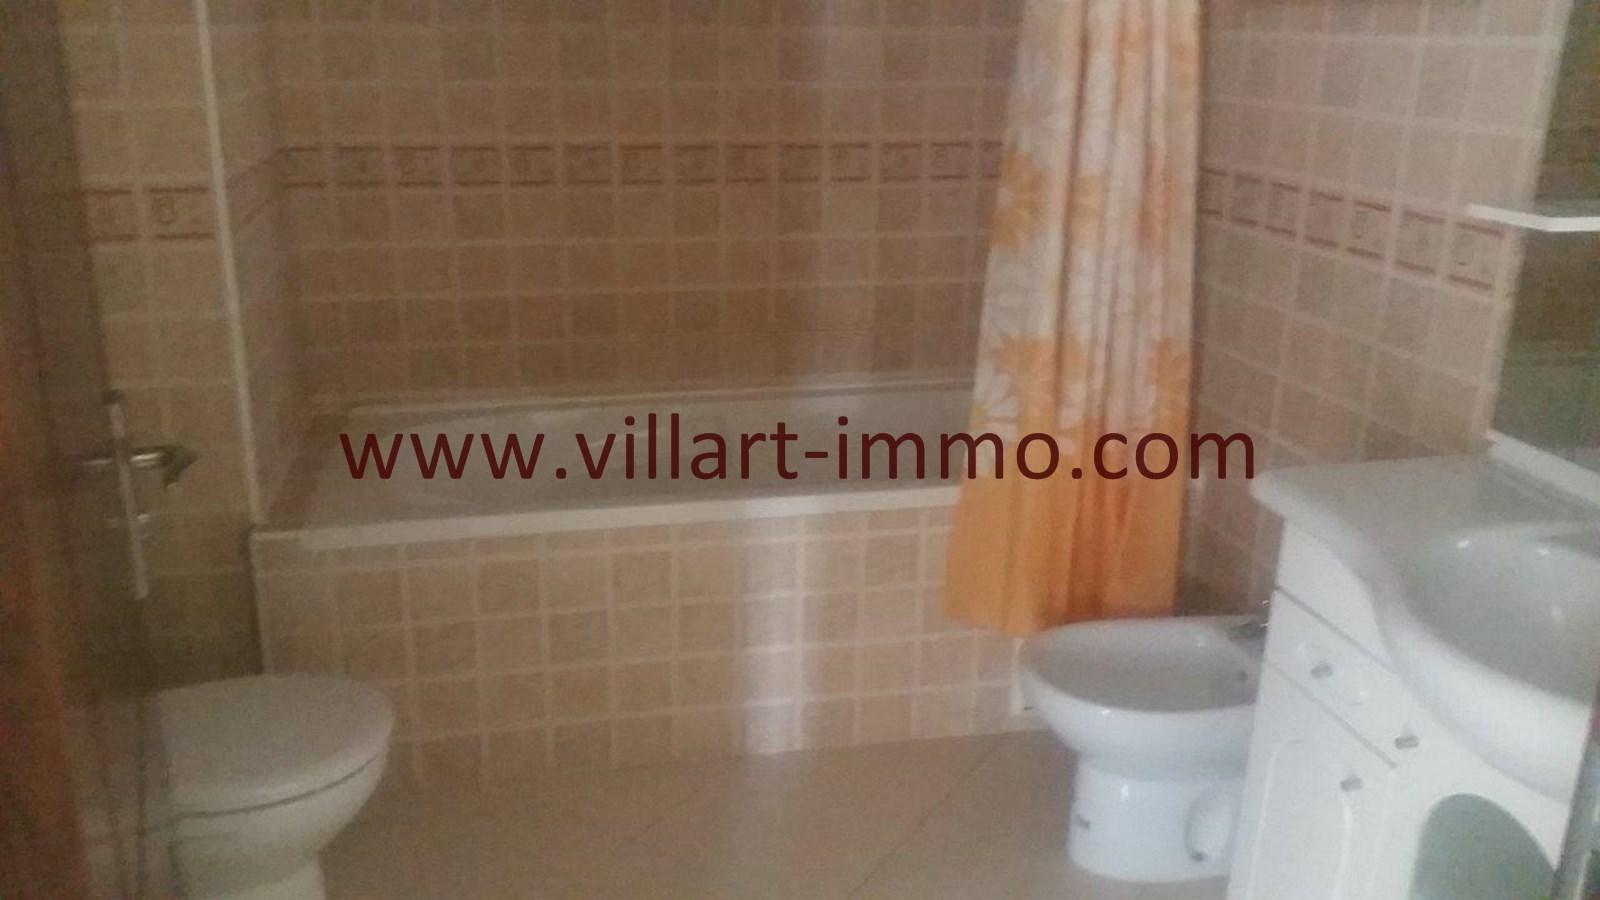 6-location-appartement-meuble-tanger-salle-de-bain-2-l955-villart-immo